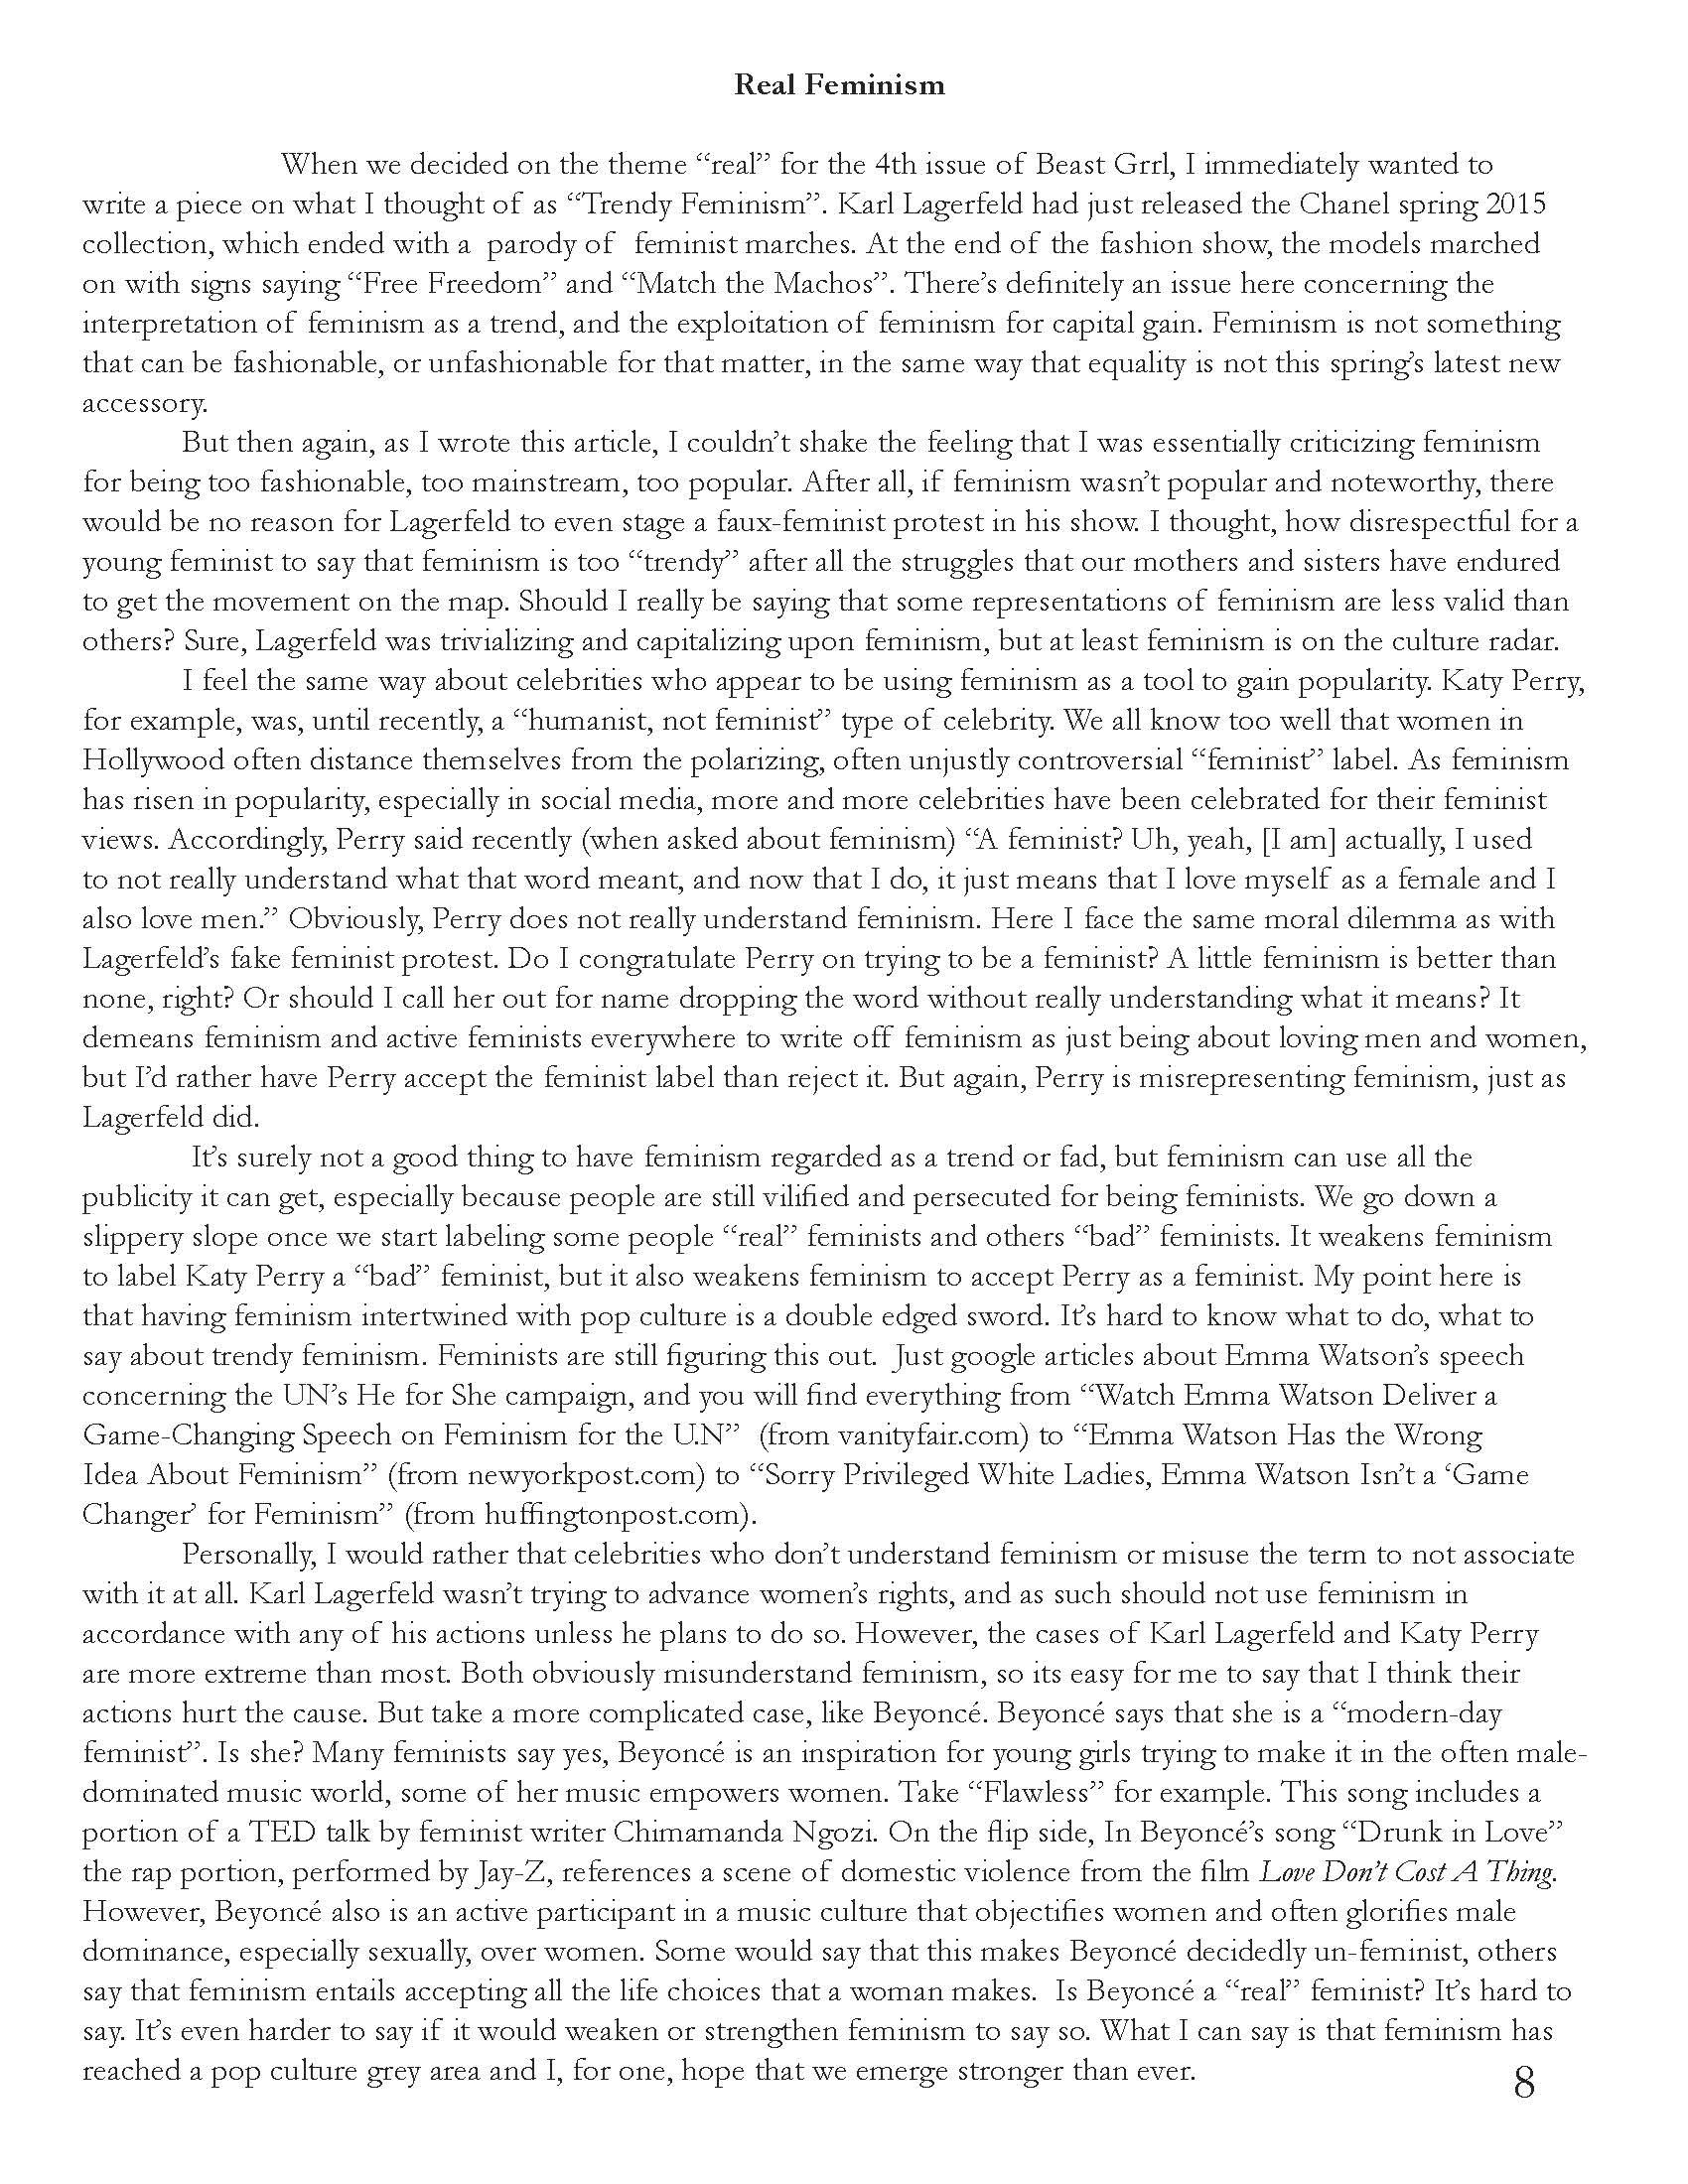 bg4_finalcopy_Page_09.jpg